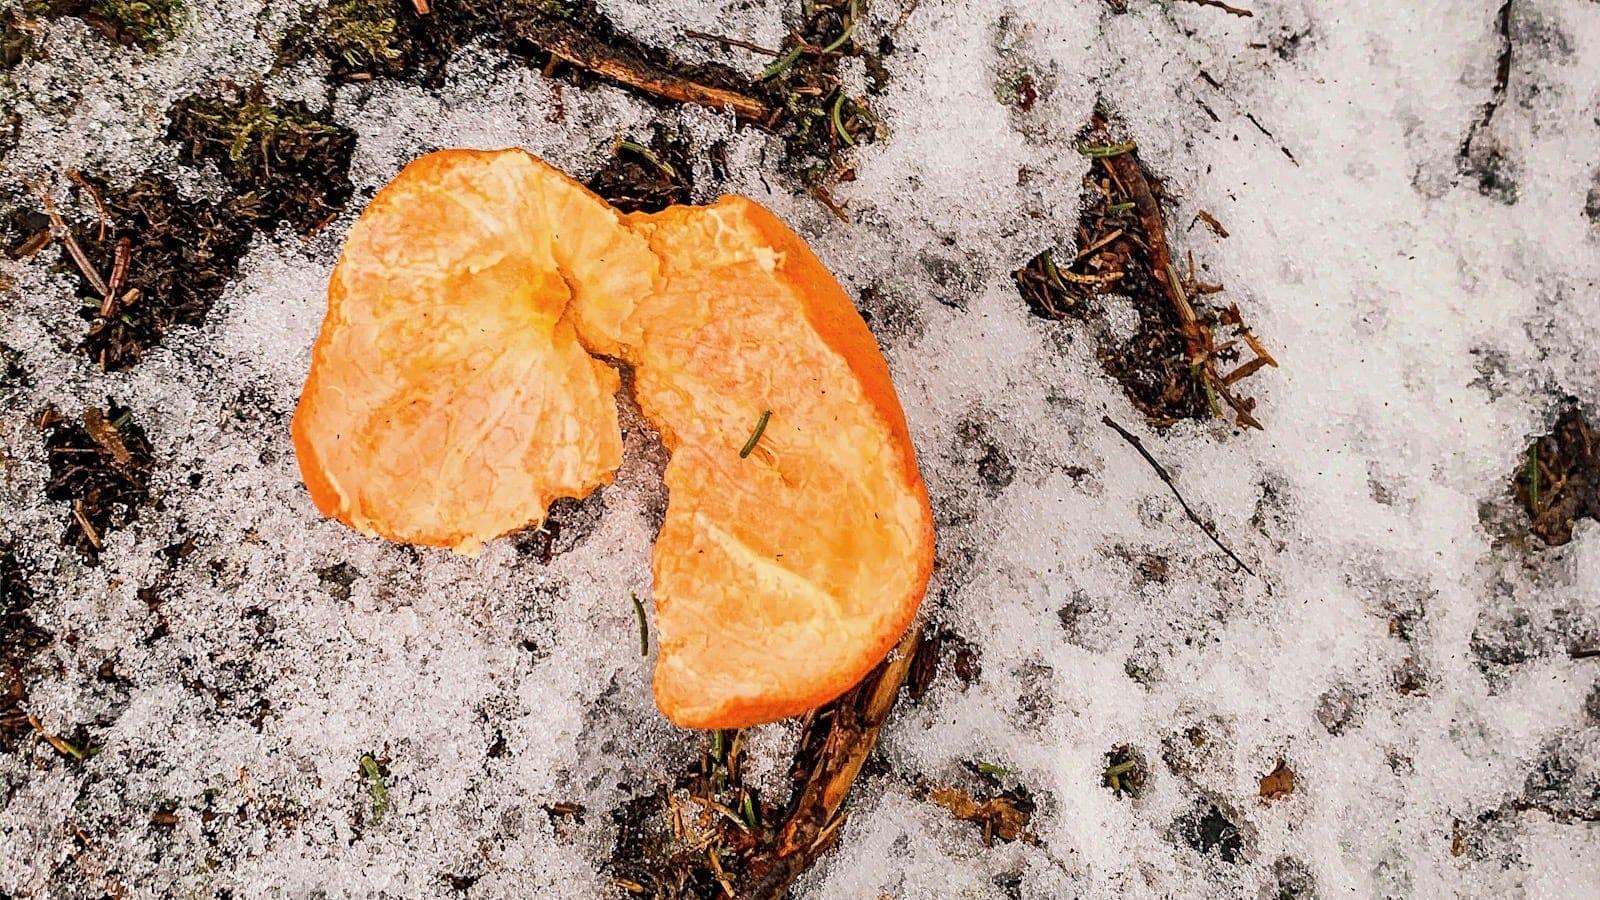 discarded orange peel sitting on snowy ground